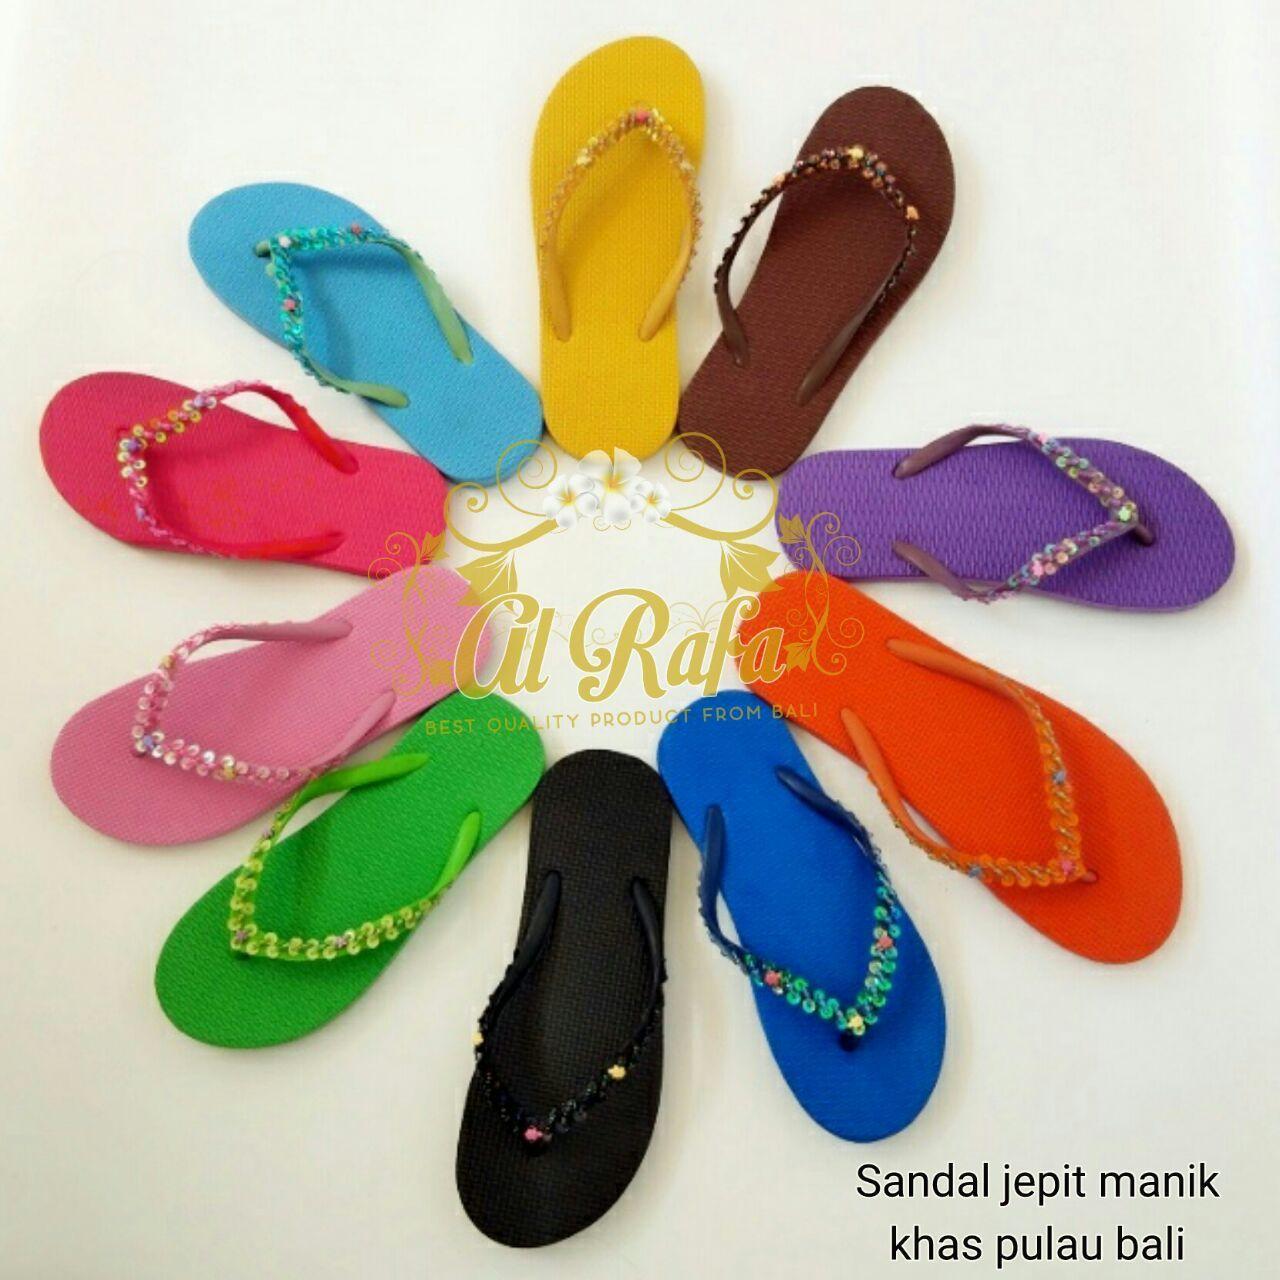 Sandal jepit manik khas bali